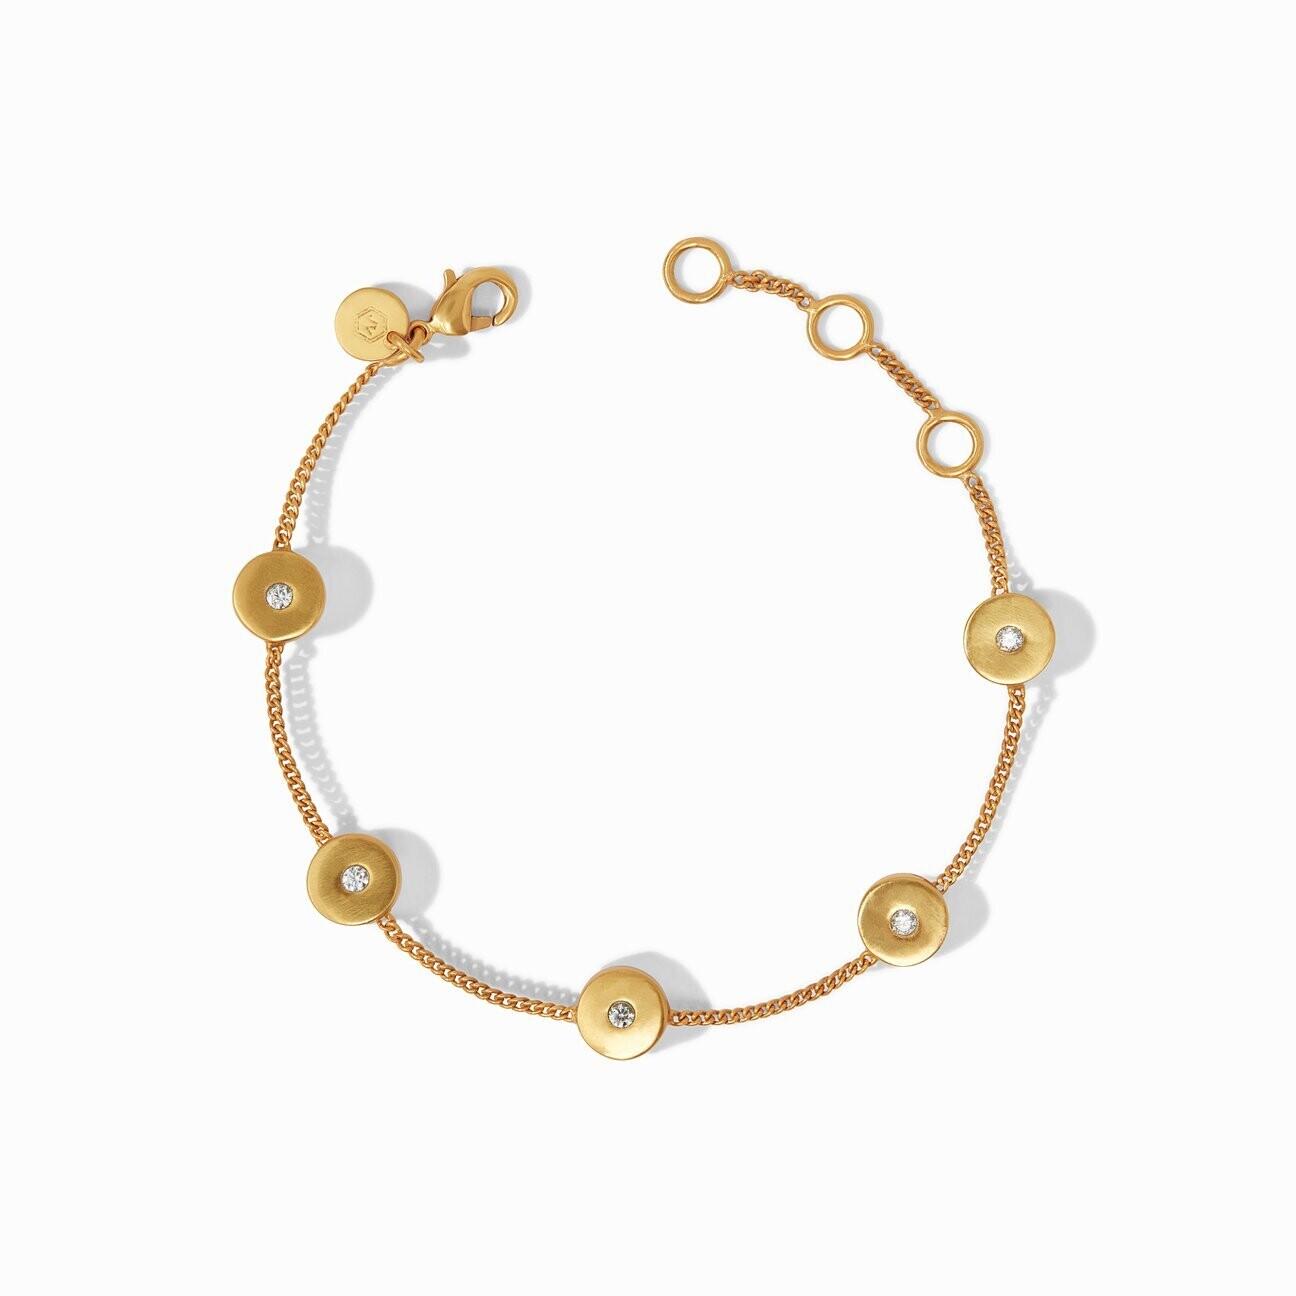 JULIE VOS Poppy Delicate Bracelet